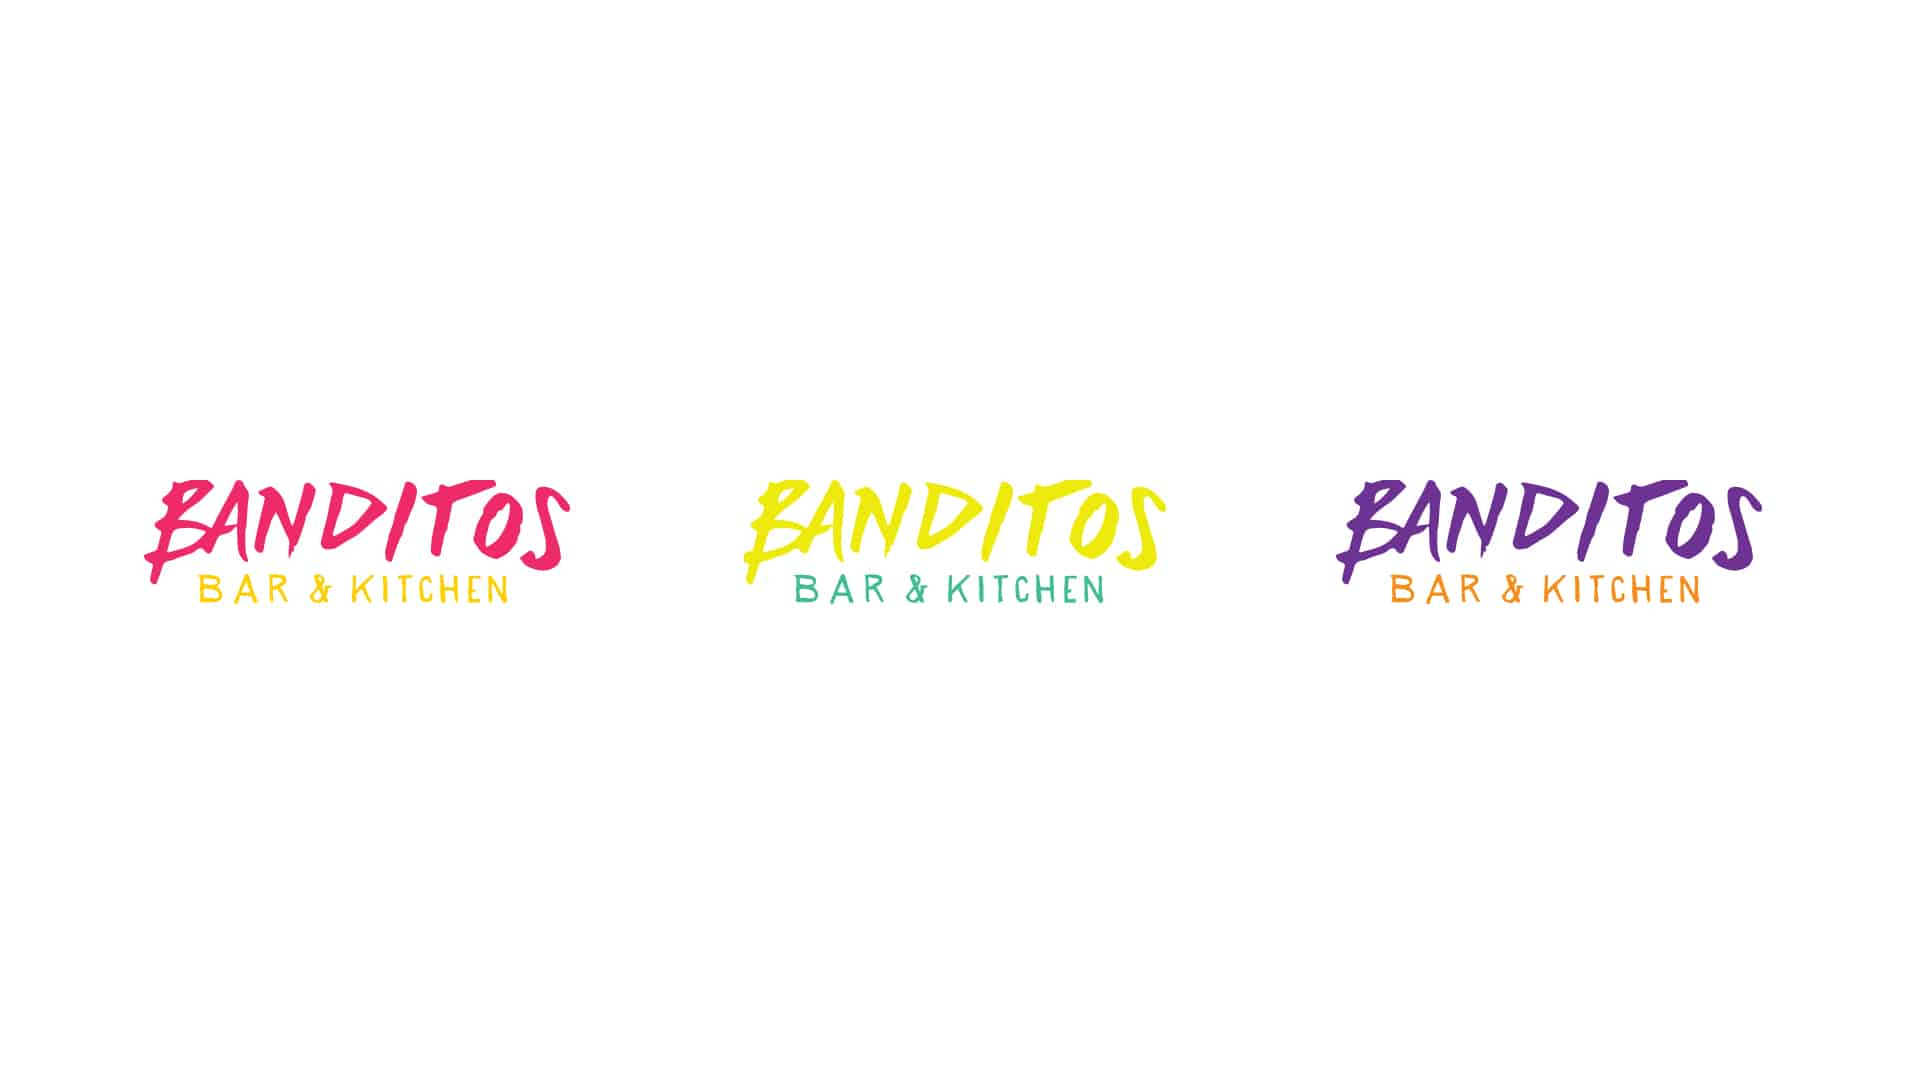 Banditos bar and kitchen rebranding and design by Vigor logo identity design